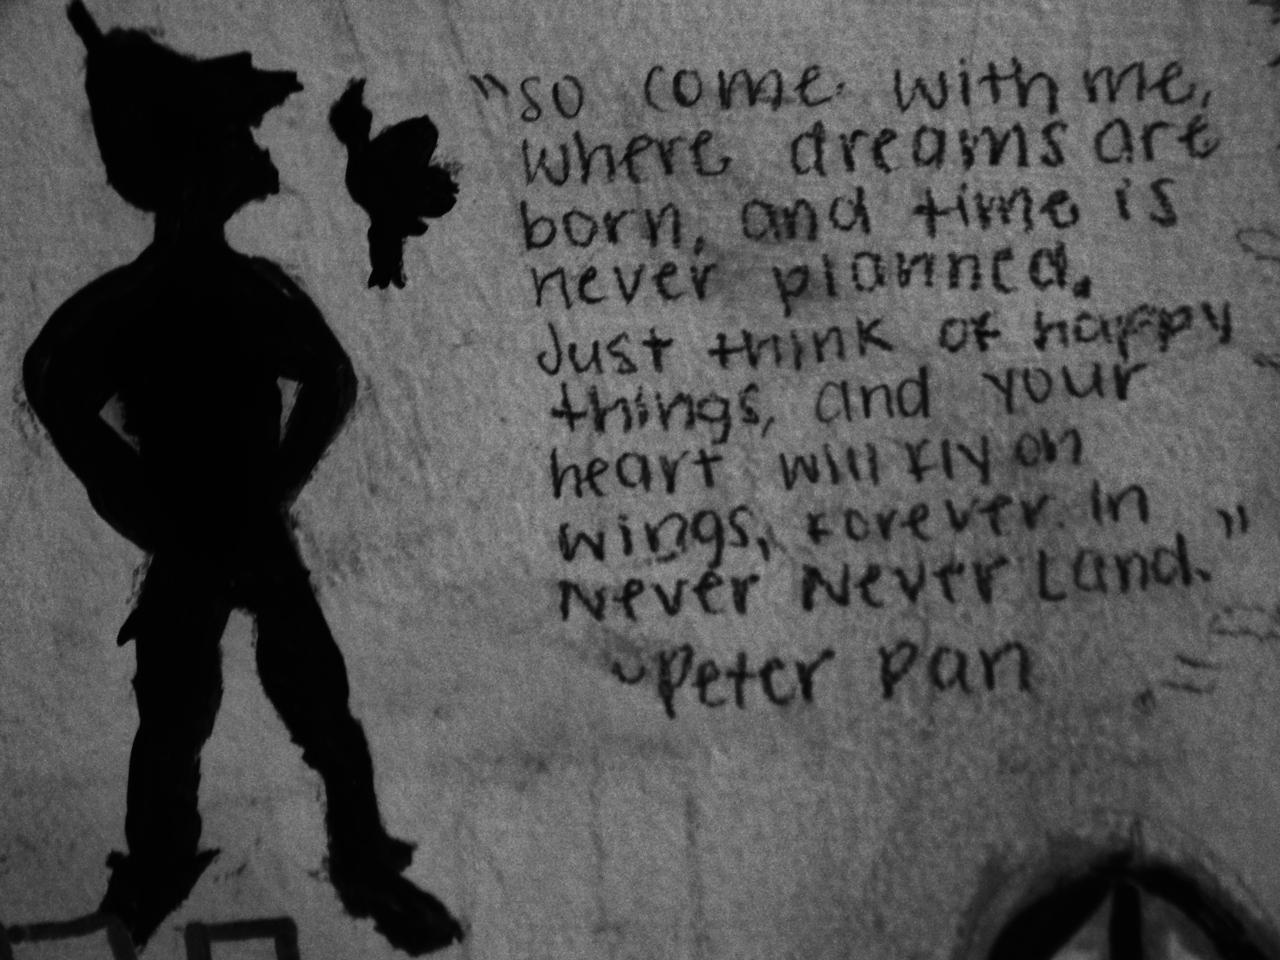 Peter Pan Quotes Wallpaper QuotesGram 1280x960